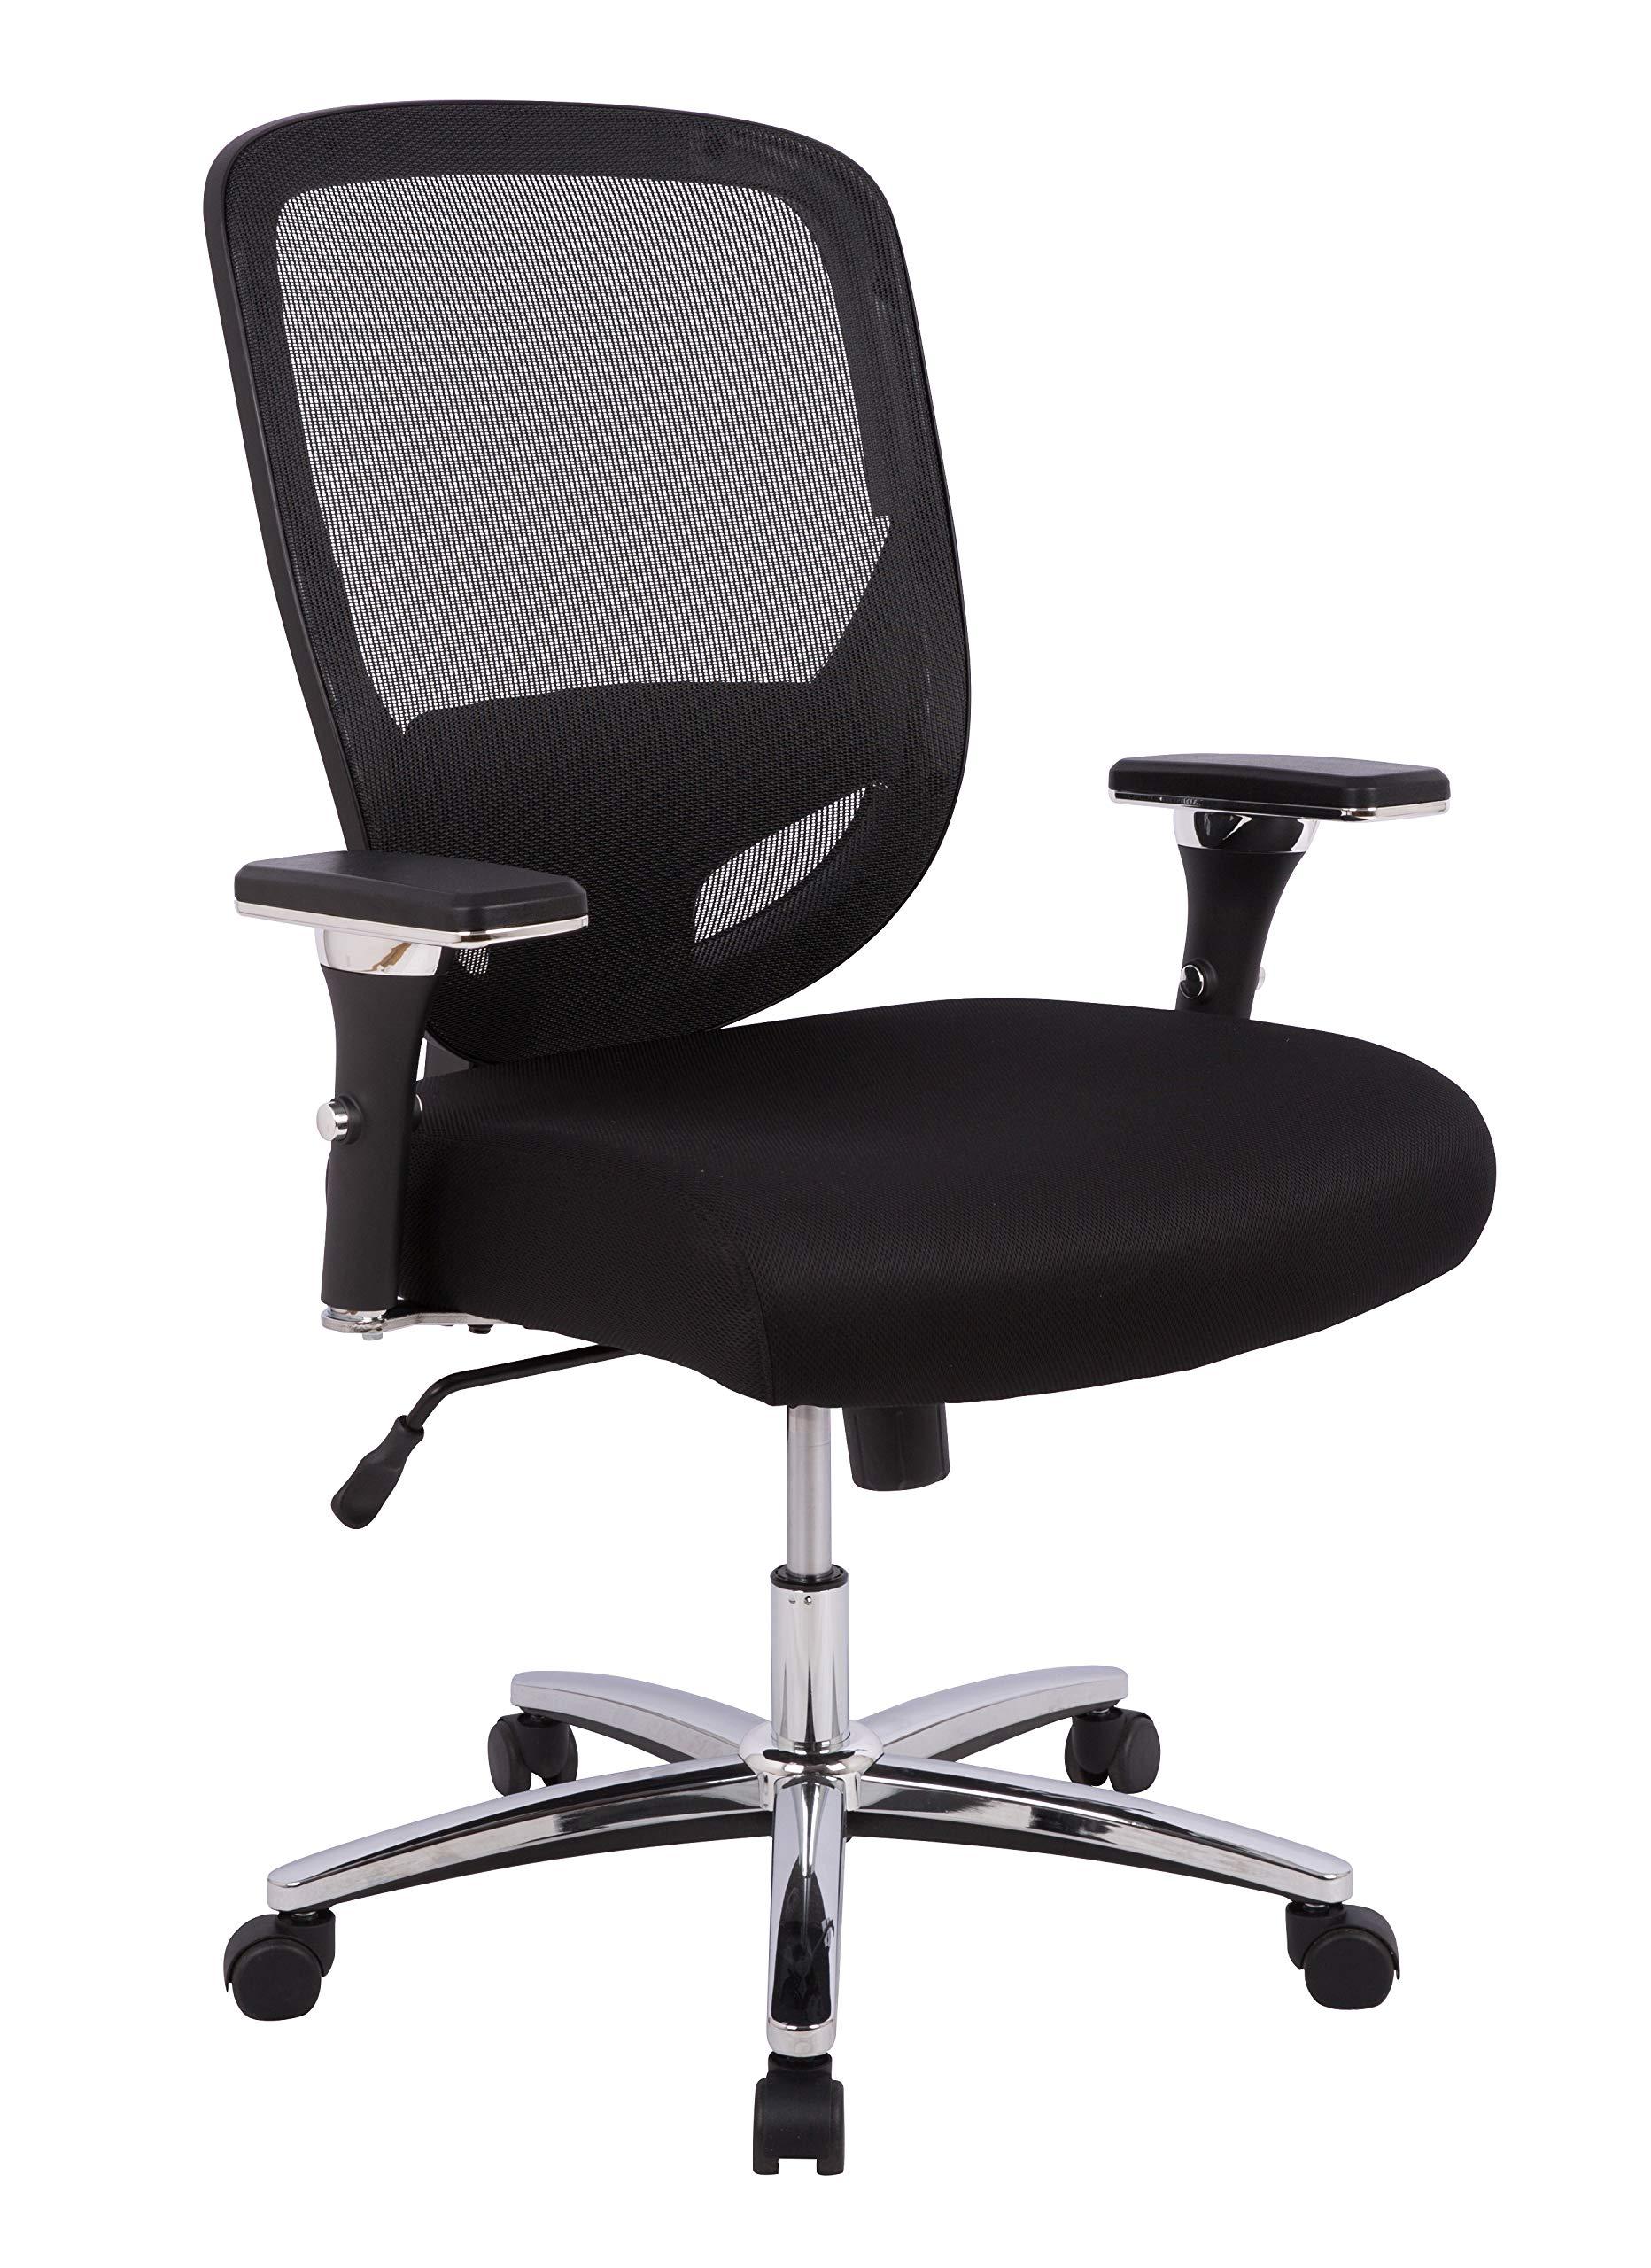 AmazonCommercial Ergonomic 500-pound Oversized Mesh Chair with Adjustable Armrests and Chrome Base- Black by AmazonCommercial